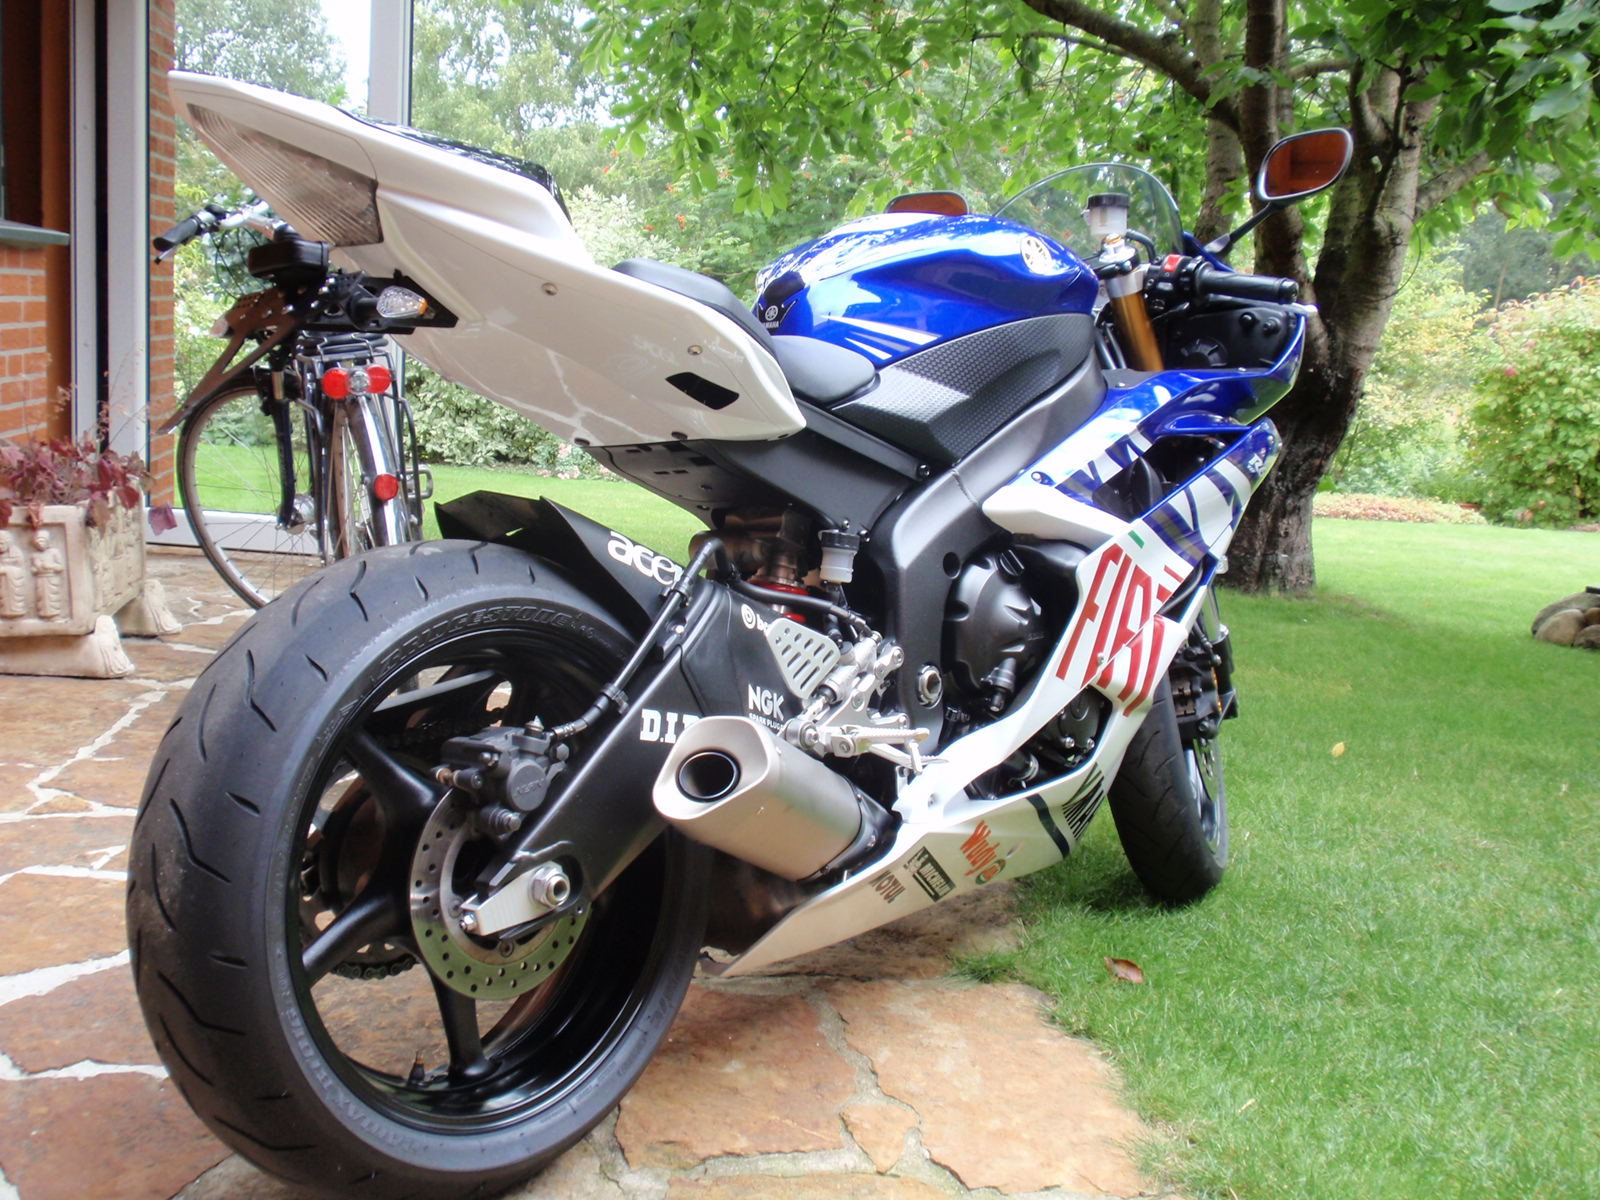 Meine Neue R6 Rj11 Replica 2007